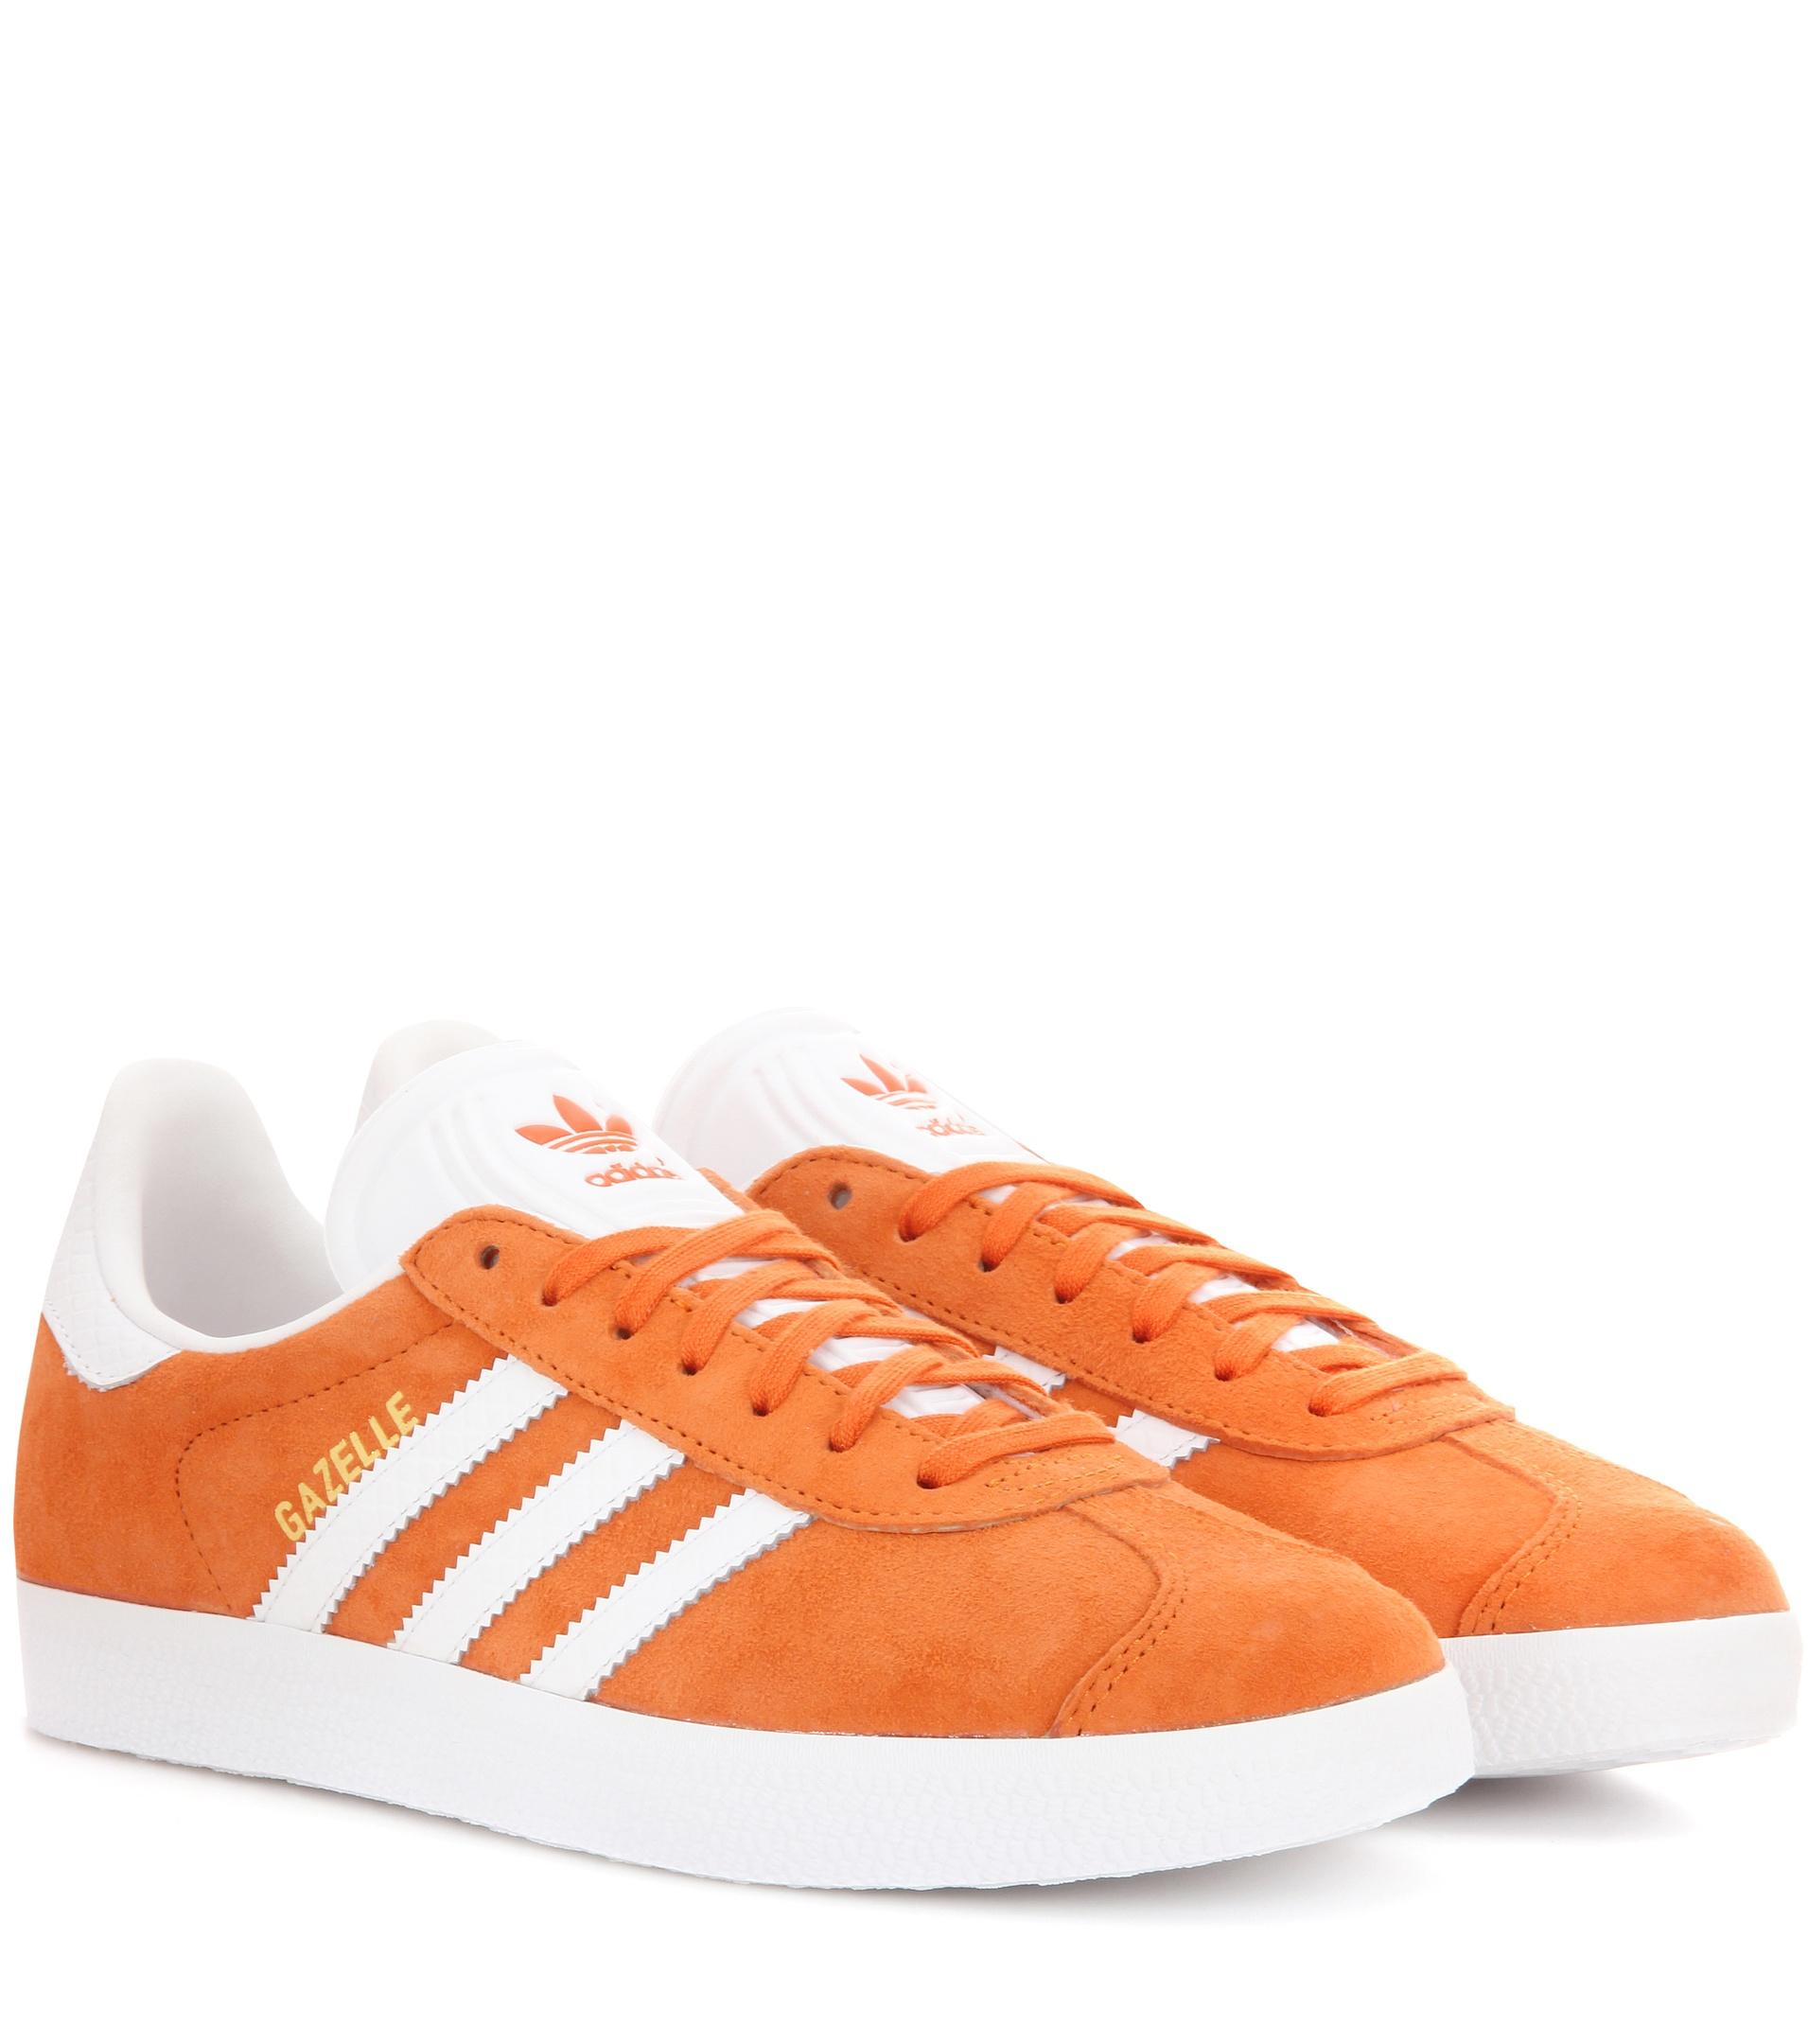 lyst adidas originals gazelle suede sneakers in orange. Black Bedroom Furniture Sets. Home Design Ideas